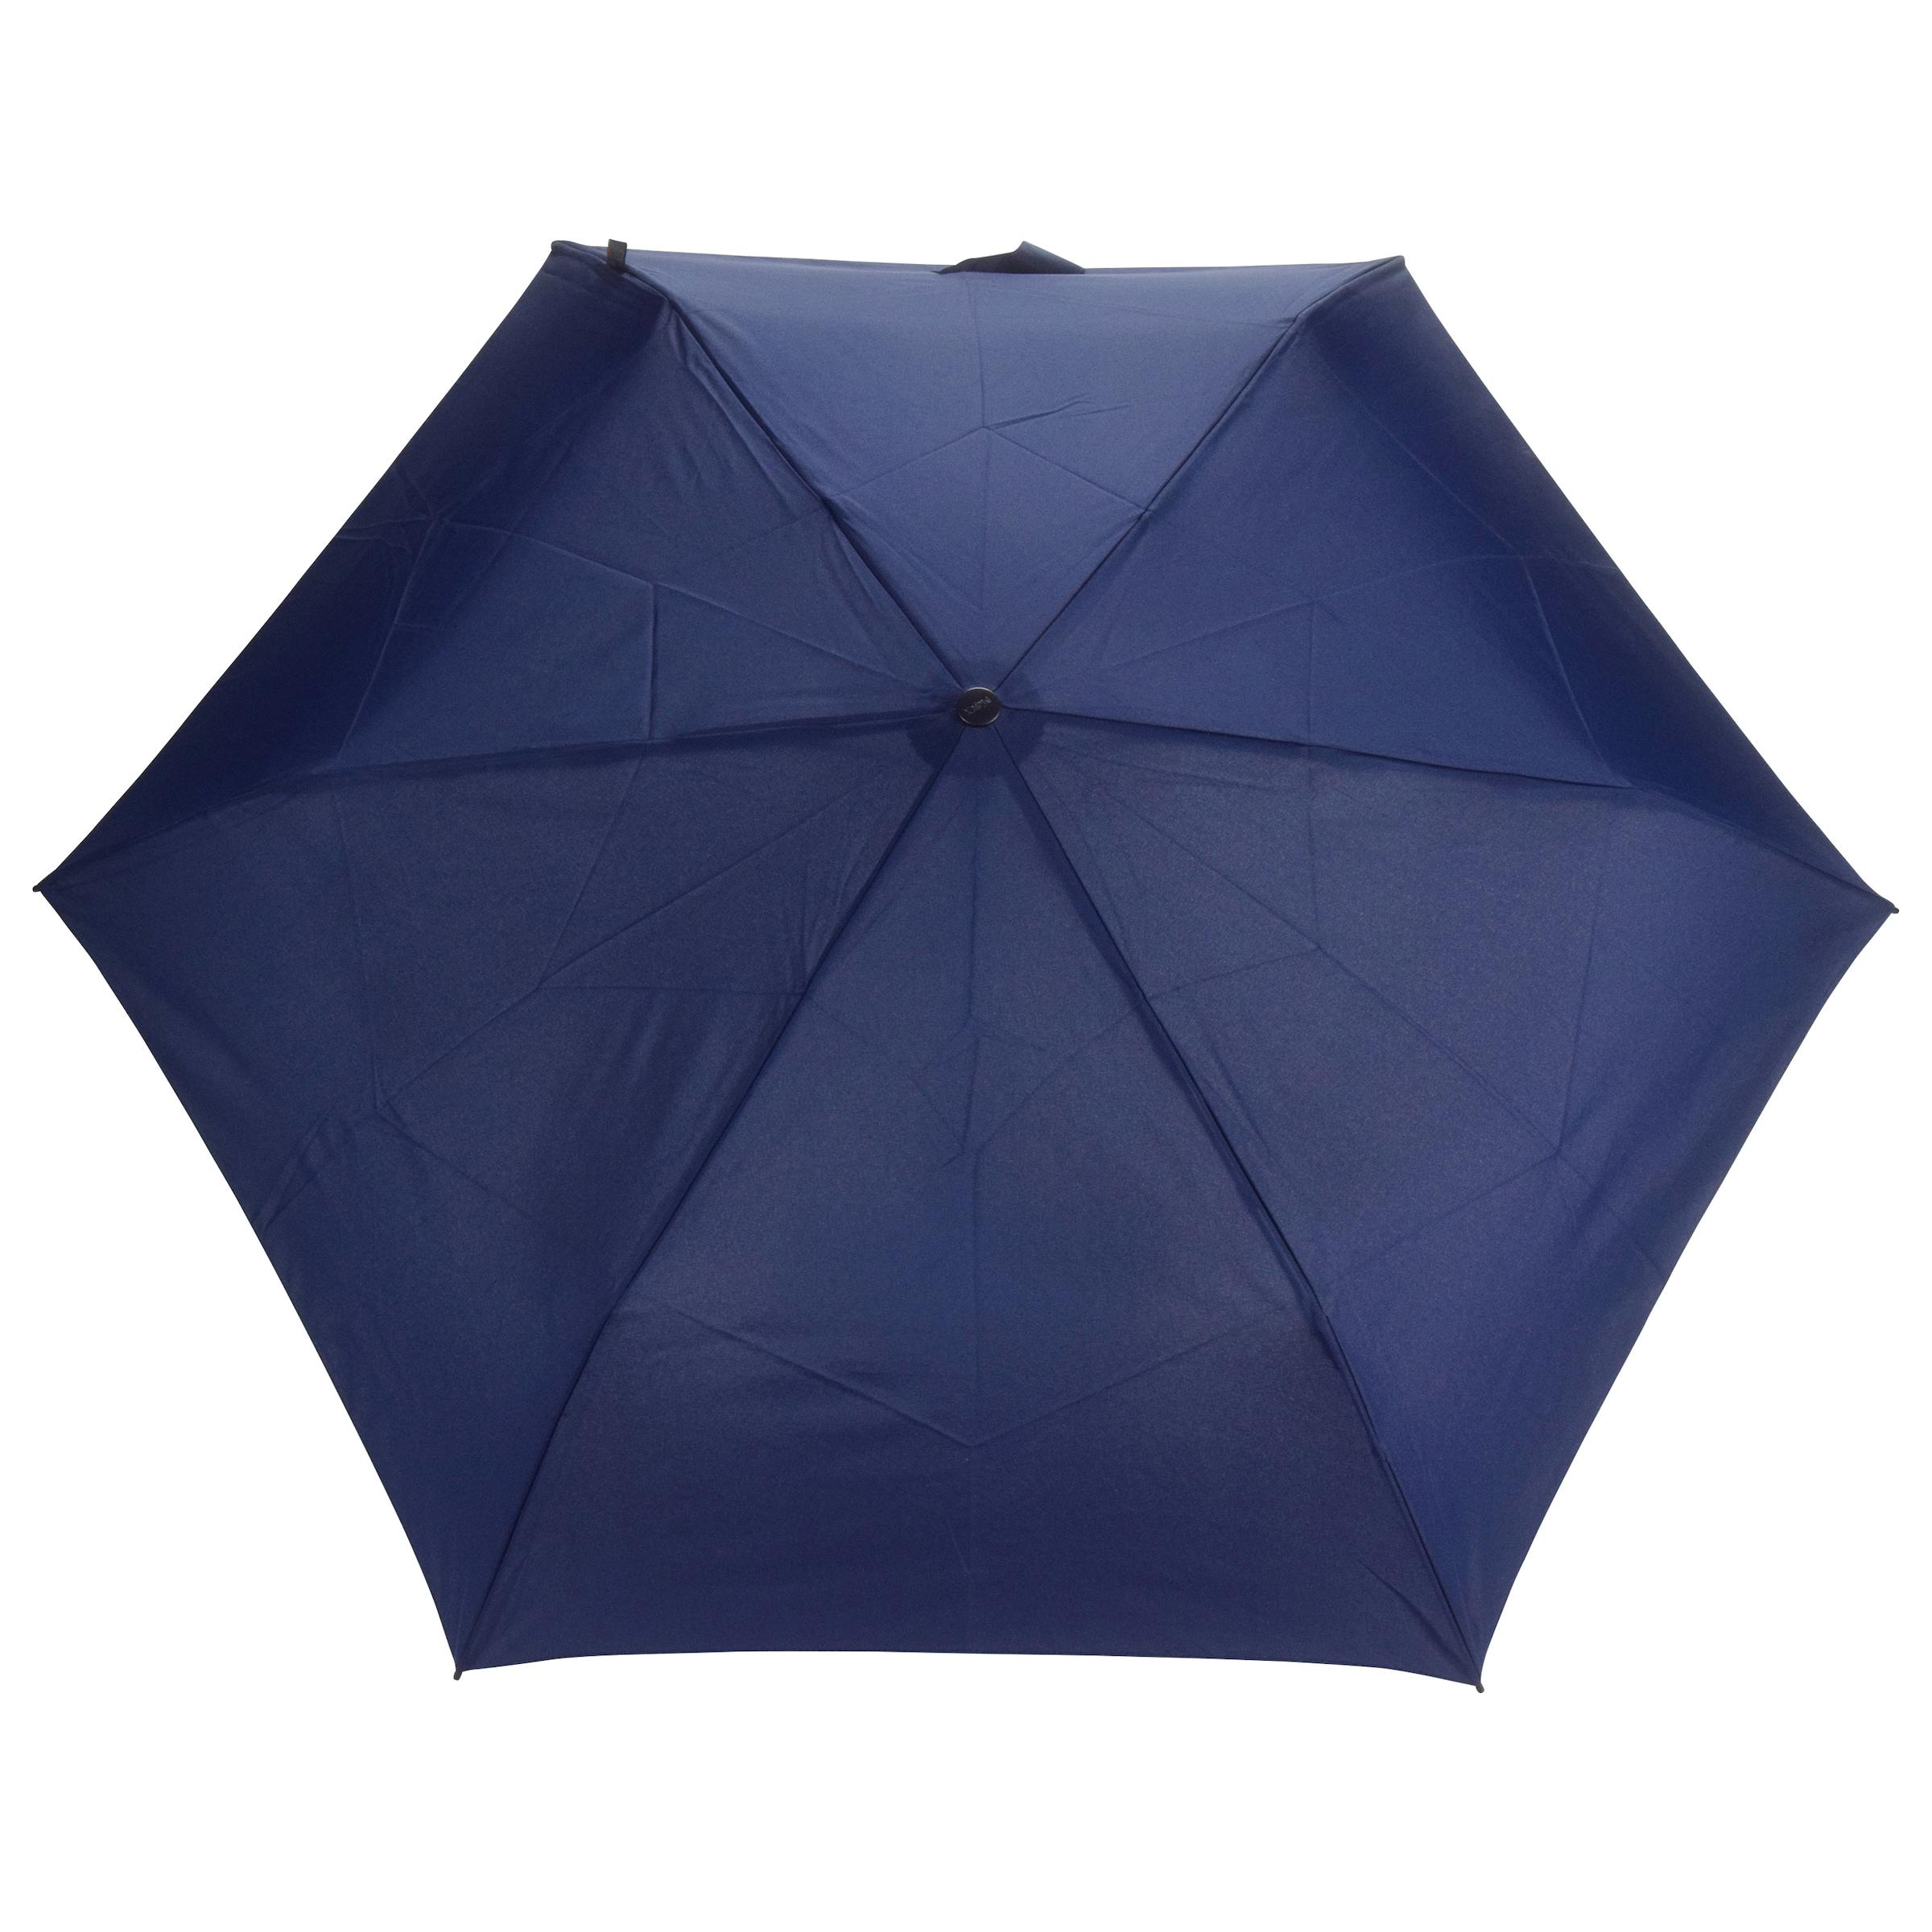 Knirps 200' Parapluie Bleu Marine En 'ts OXuwTkiPZ